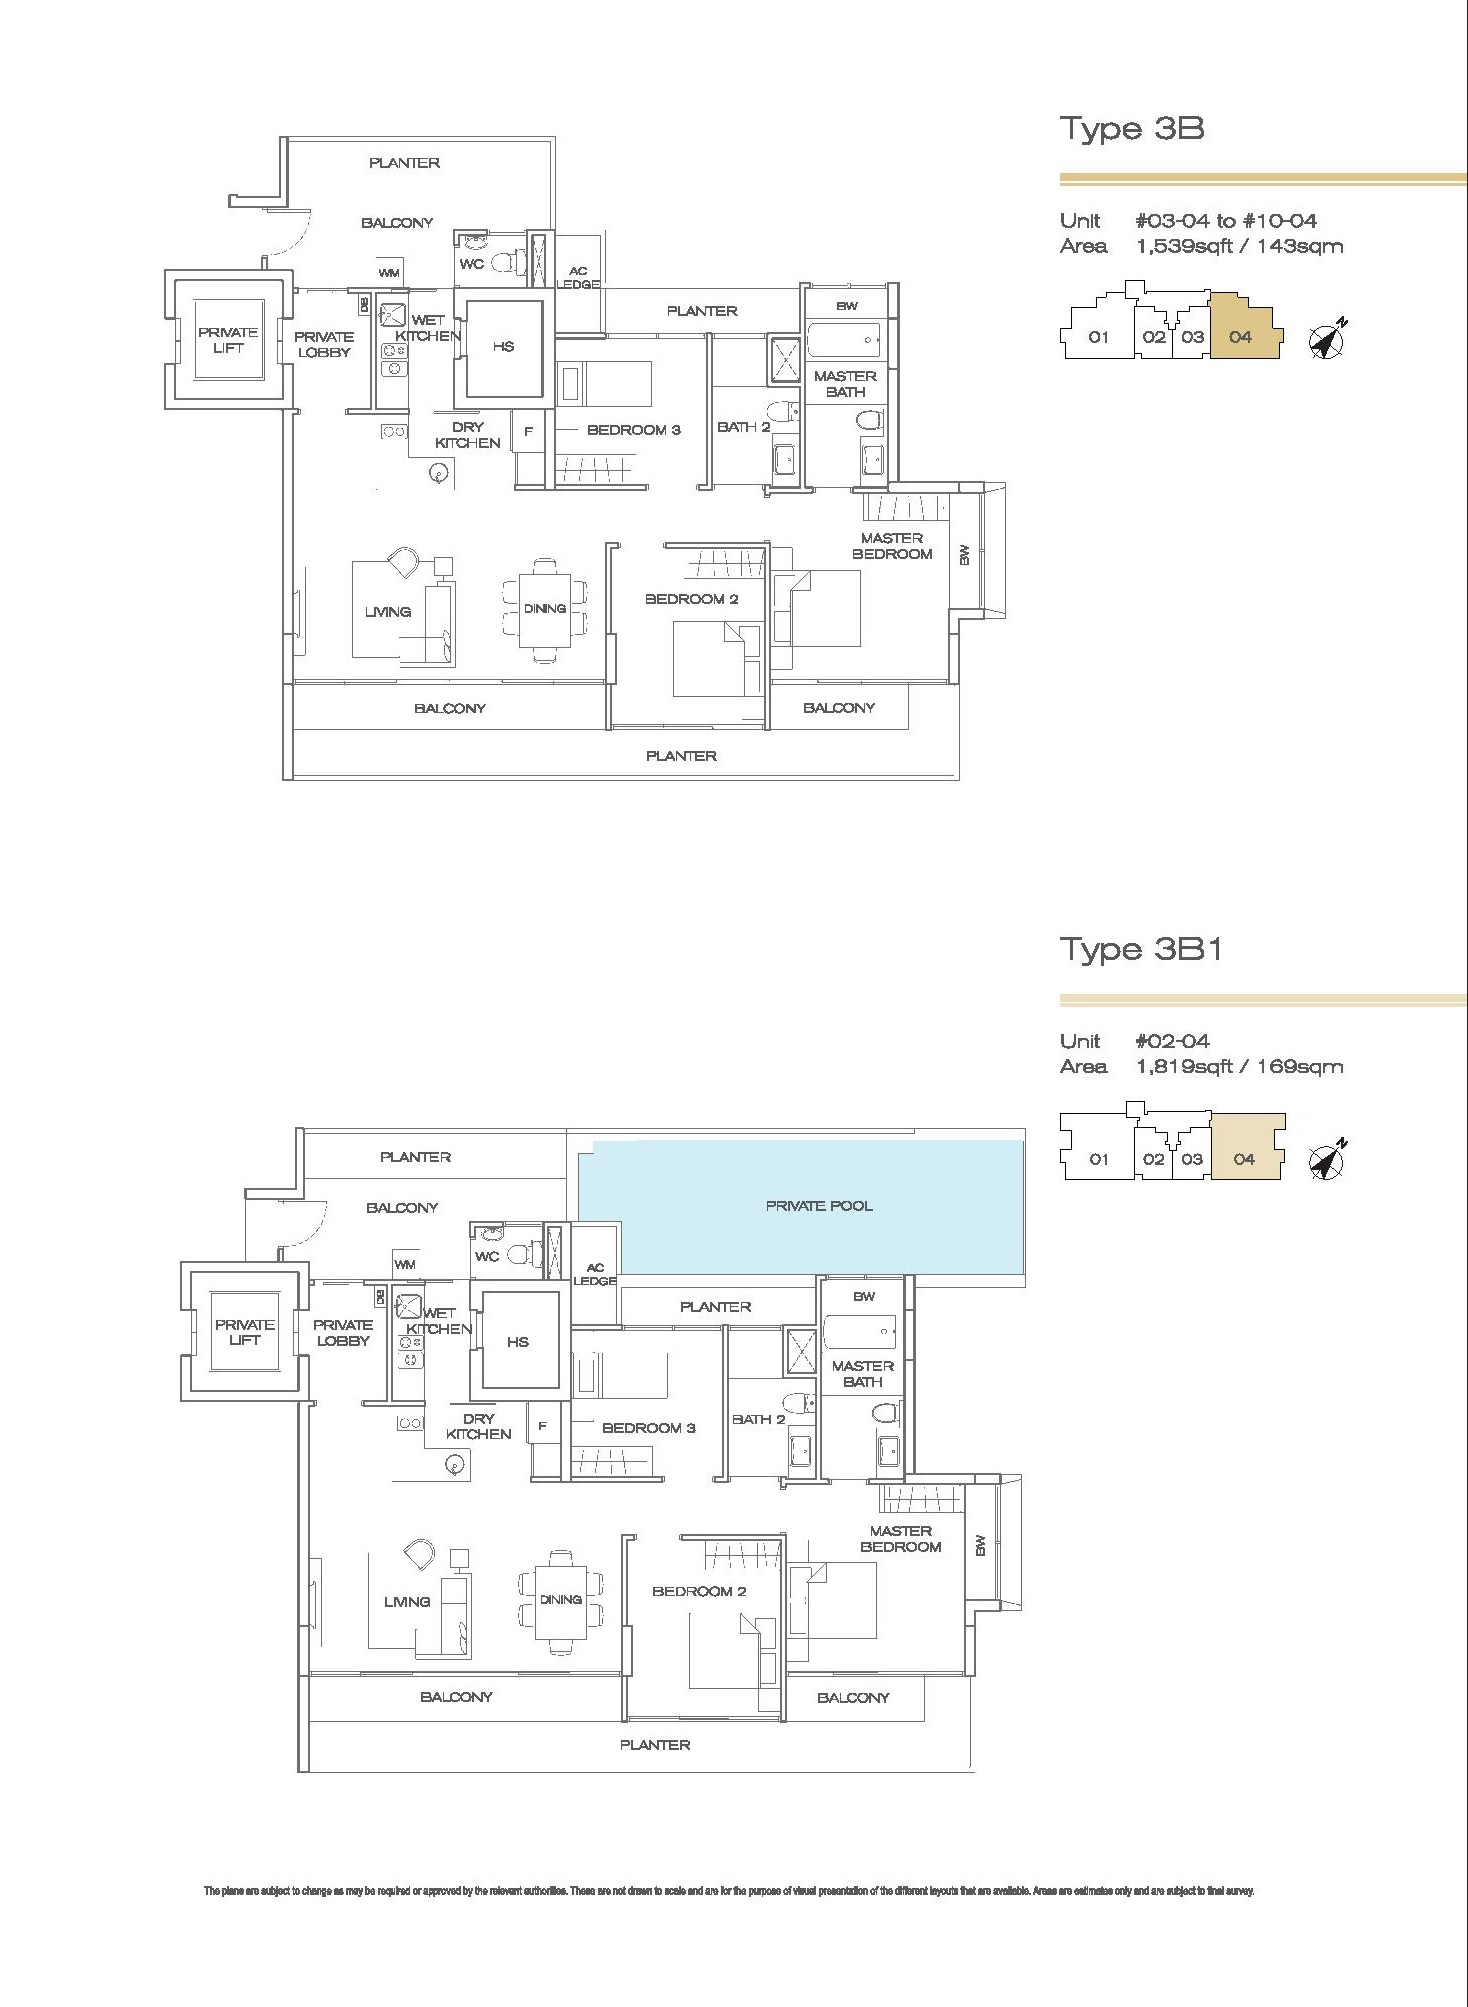 Three Balmoral 3 Bedroom Type 3B, 3B1 Floor Plans